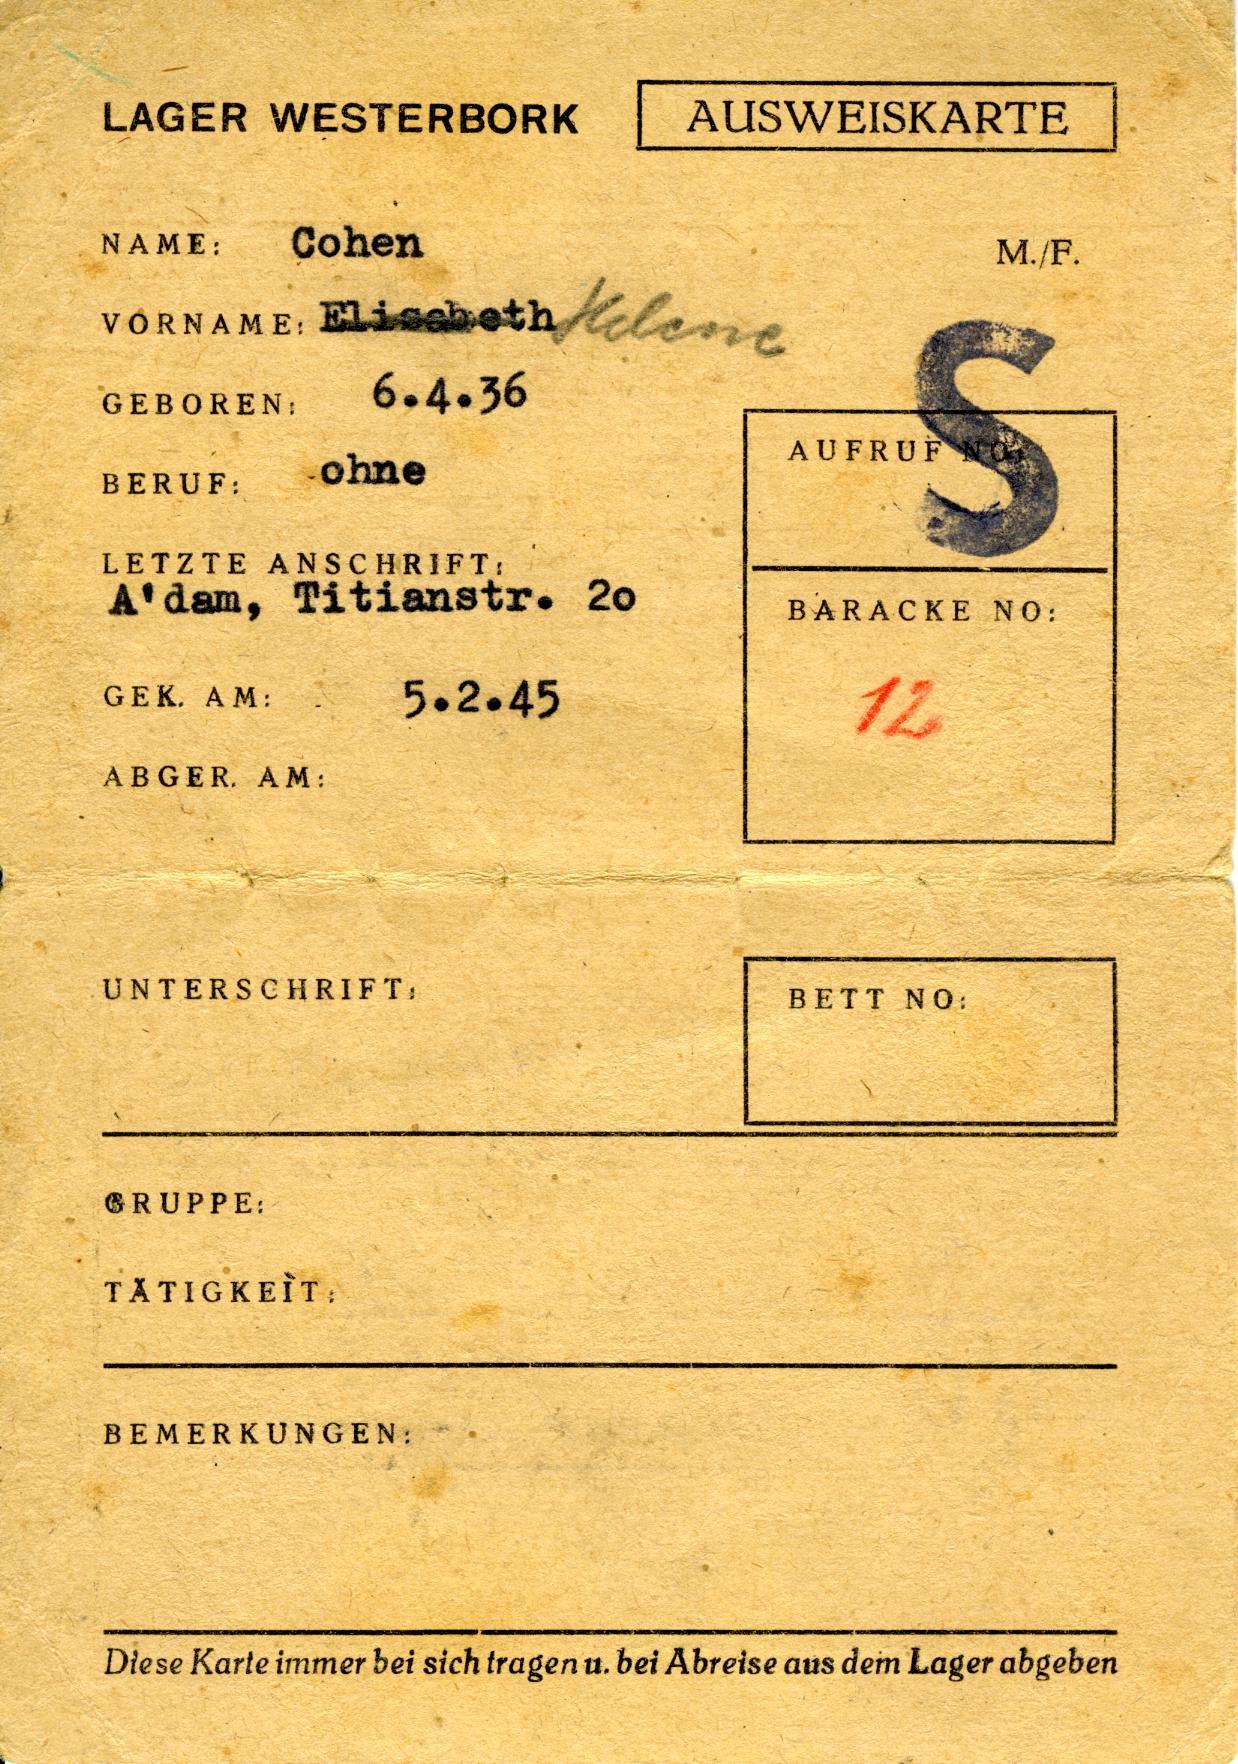 Ausweiskaart Helene Cohen uit kamp Westerbork.